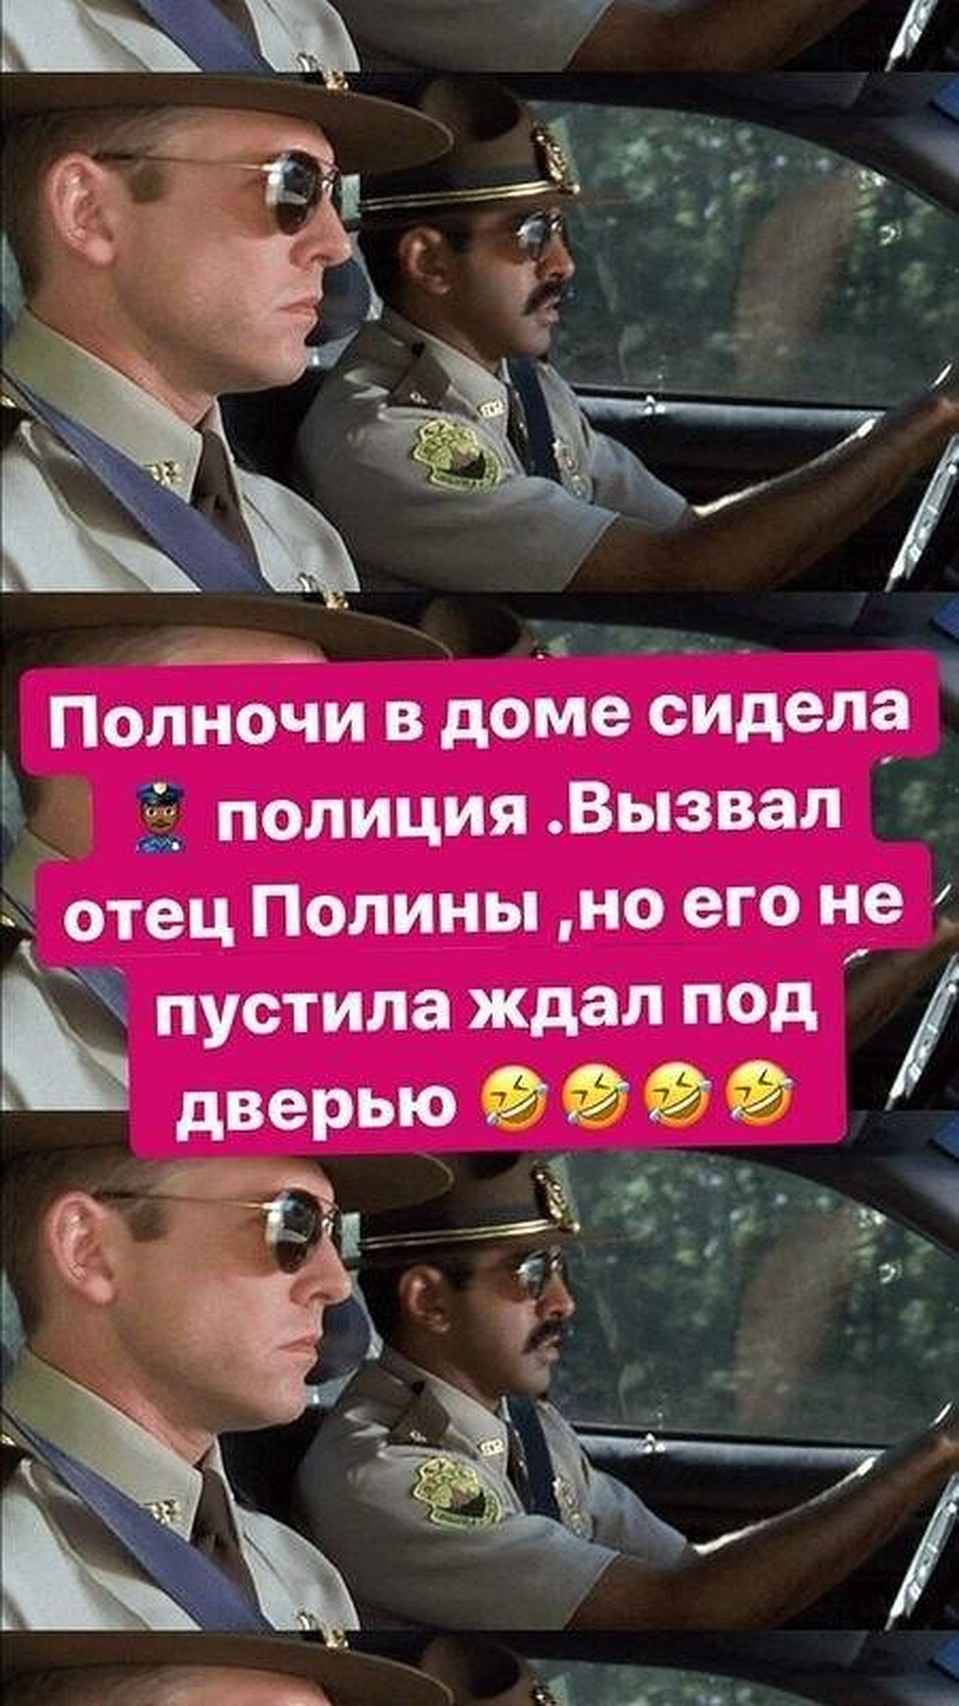 Максим аксенов бывший гражданский муж дана борисова